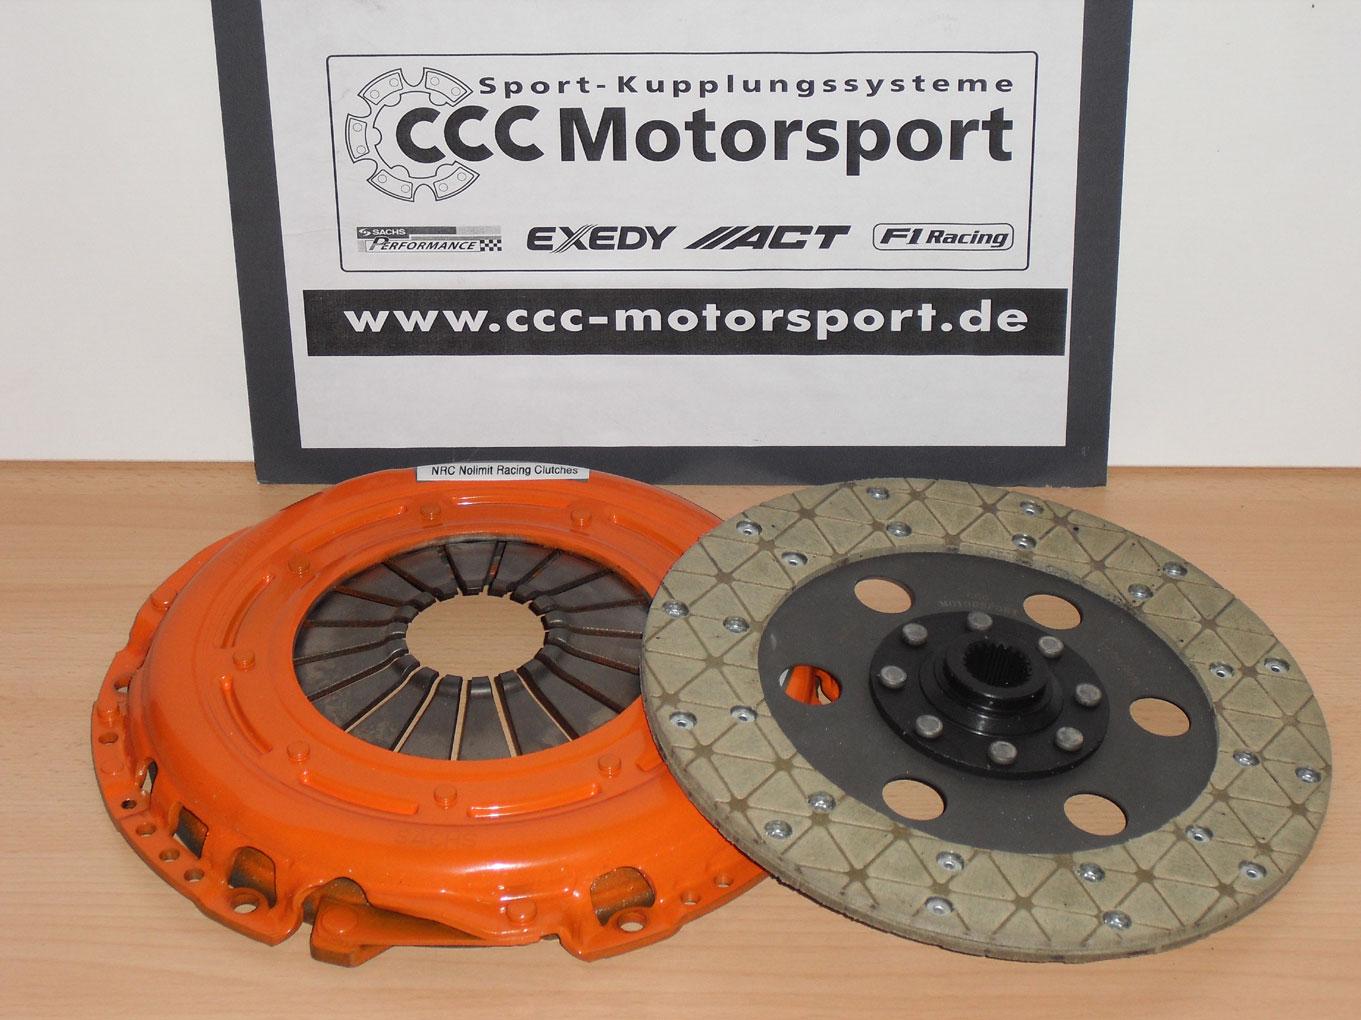 clutch kit reinforced kevlar Audi A3 S3 8P 2 0TFSI VW Golf mk5 mk6 GTI Seat  Leon Cupra 2 0TFSI 1P Sachs Performance 001394 999502K-CCC